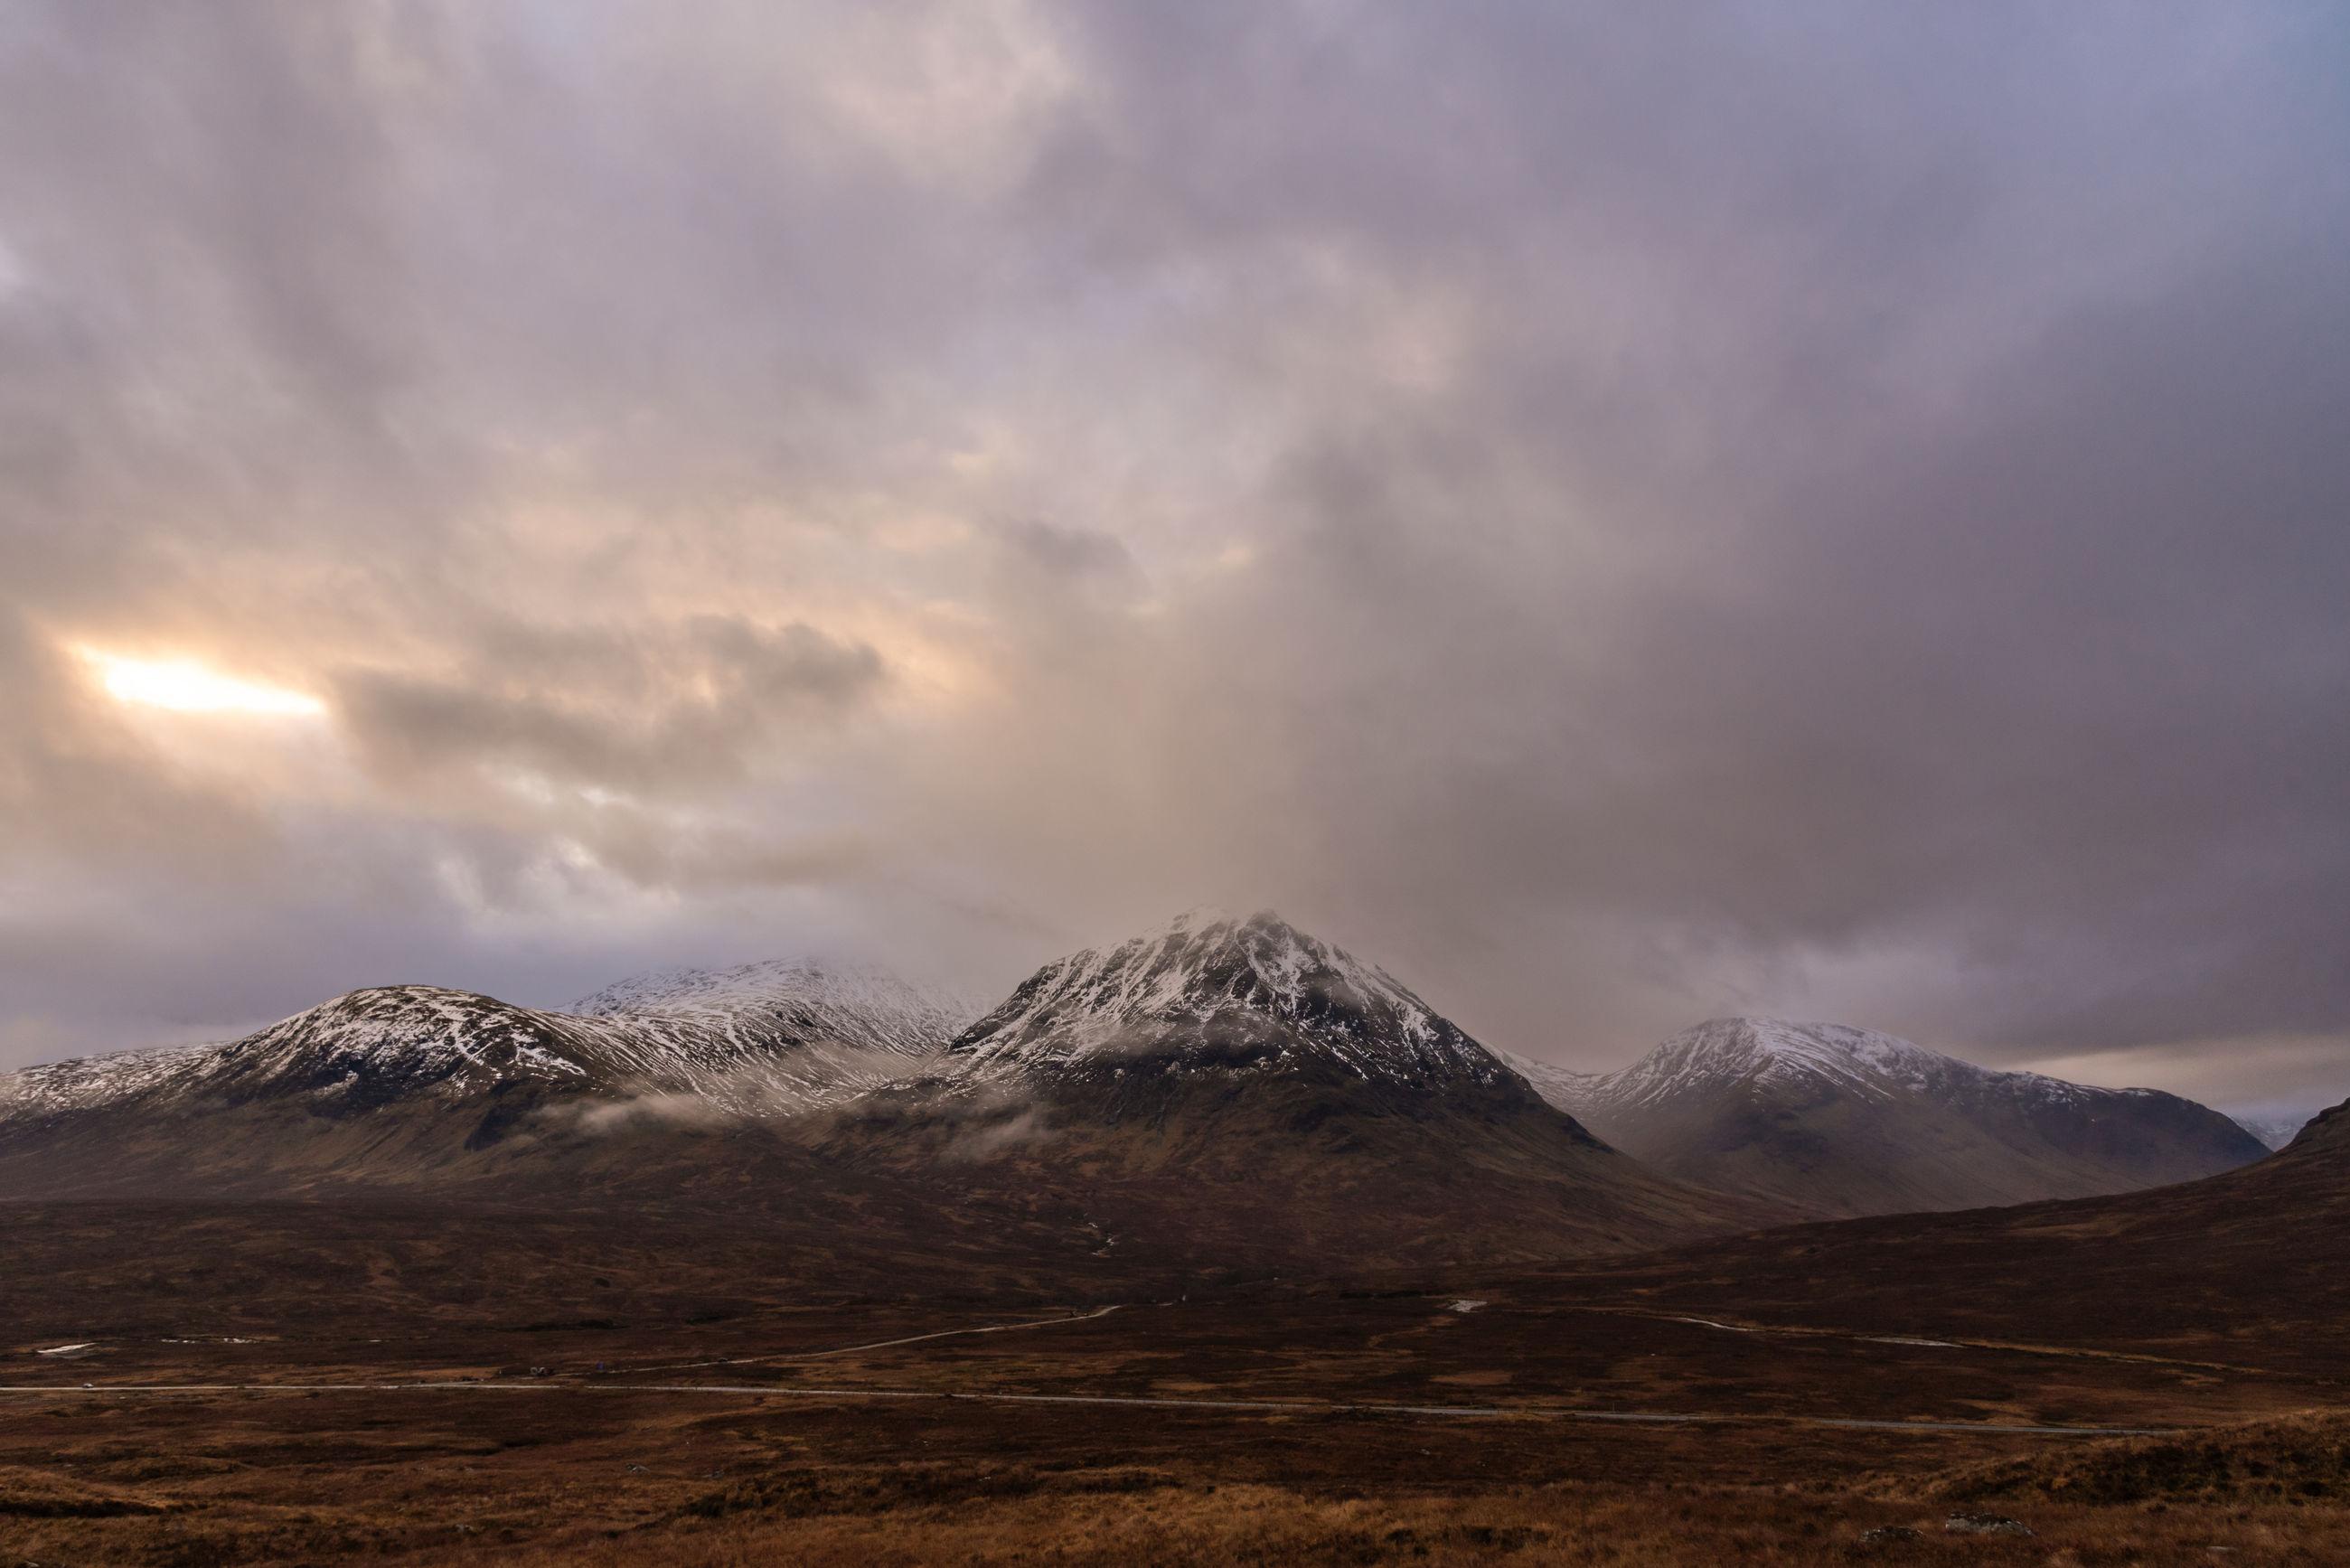 West highlands way - hiking in scotland, winter